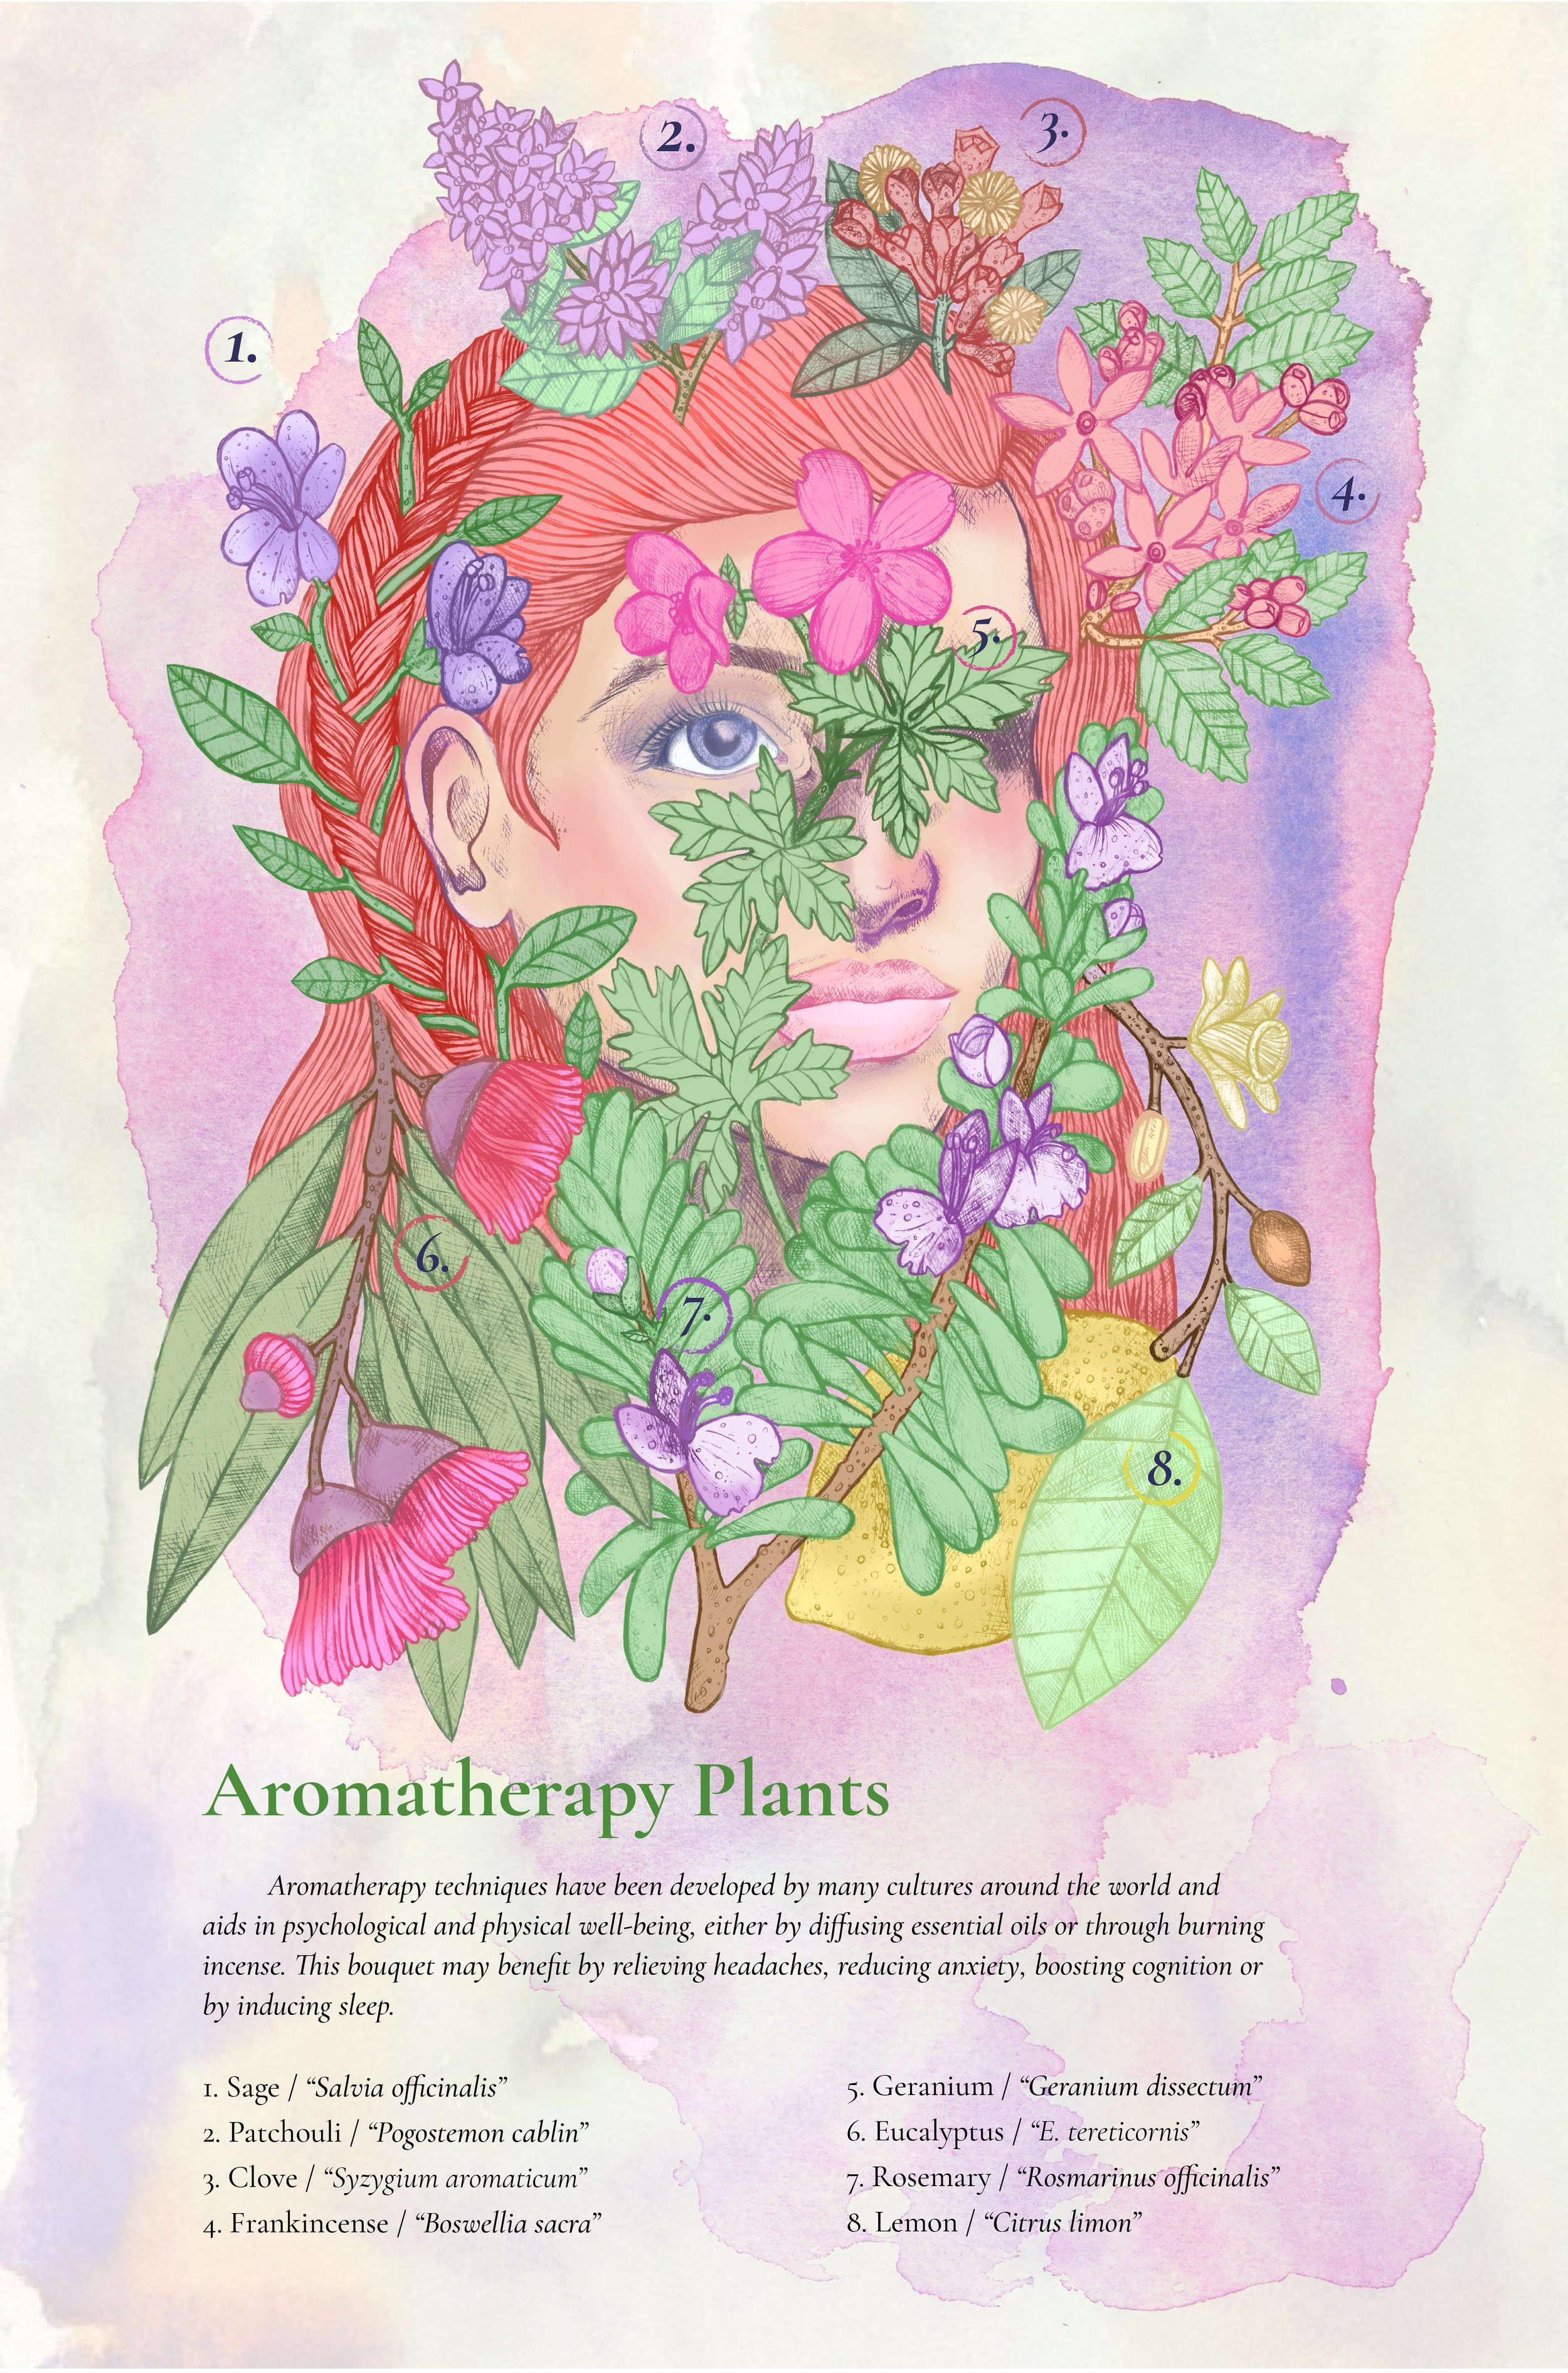 AromatherapyPlants_StephenMcdowforweb.jpg